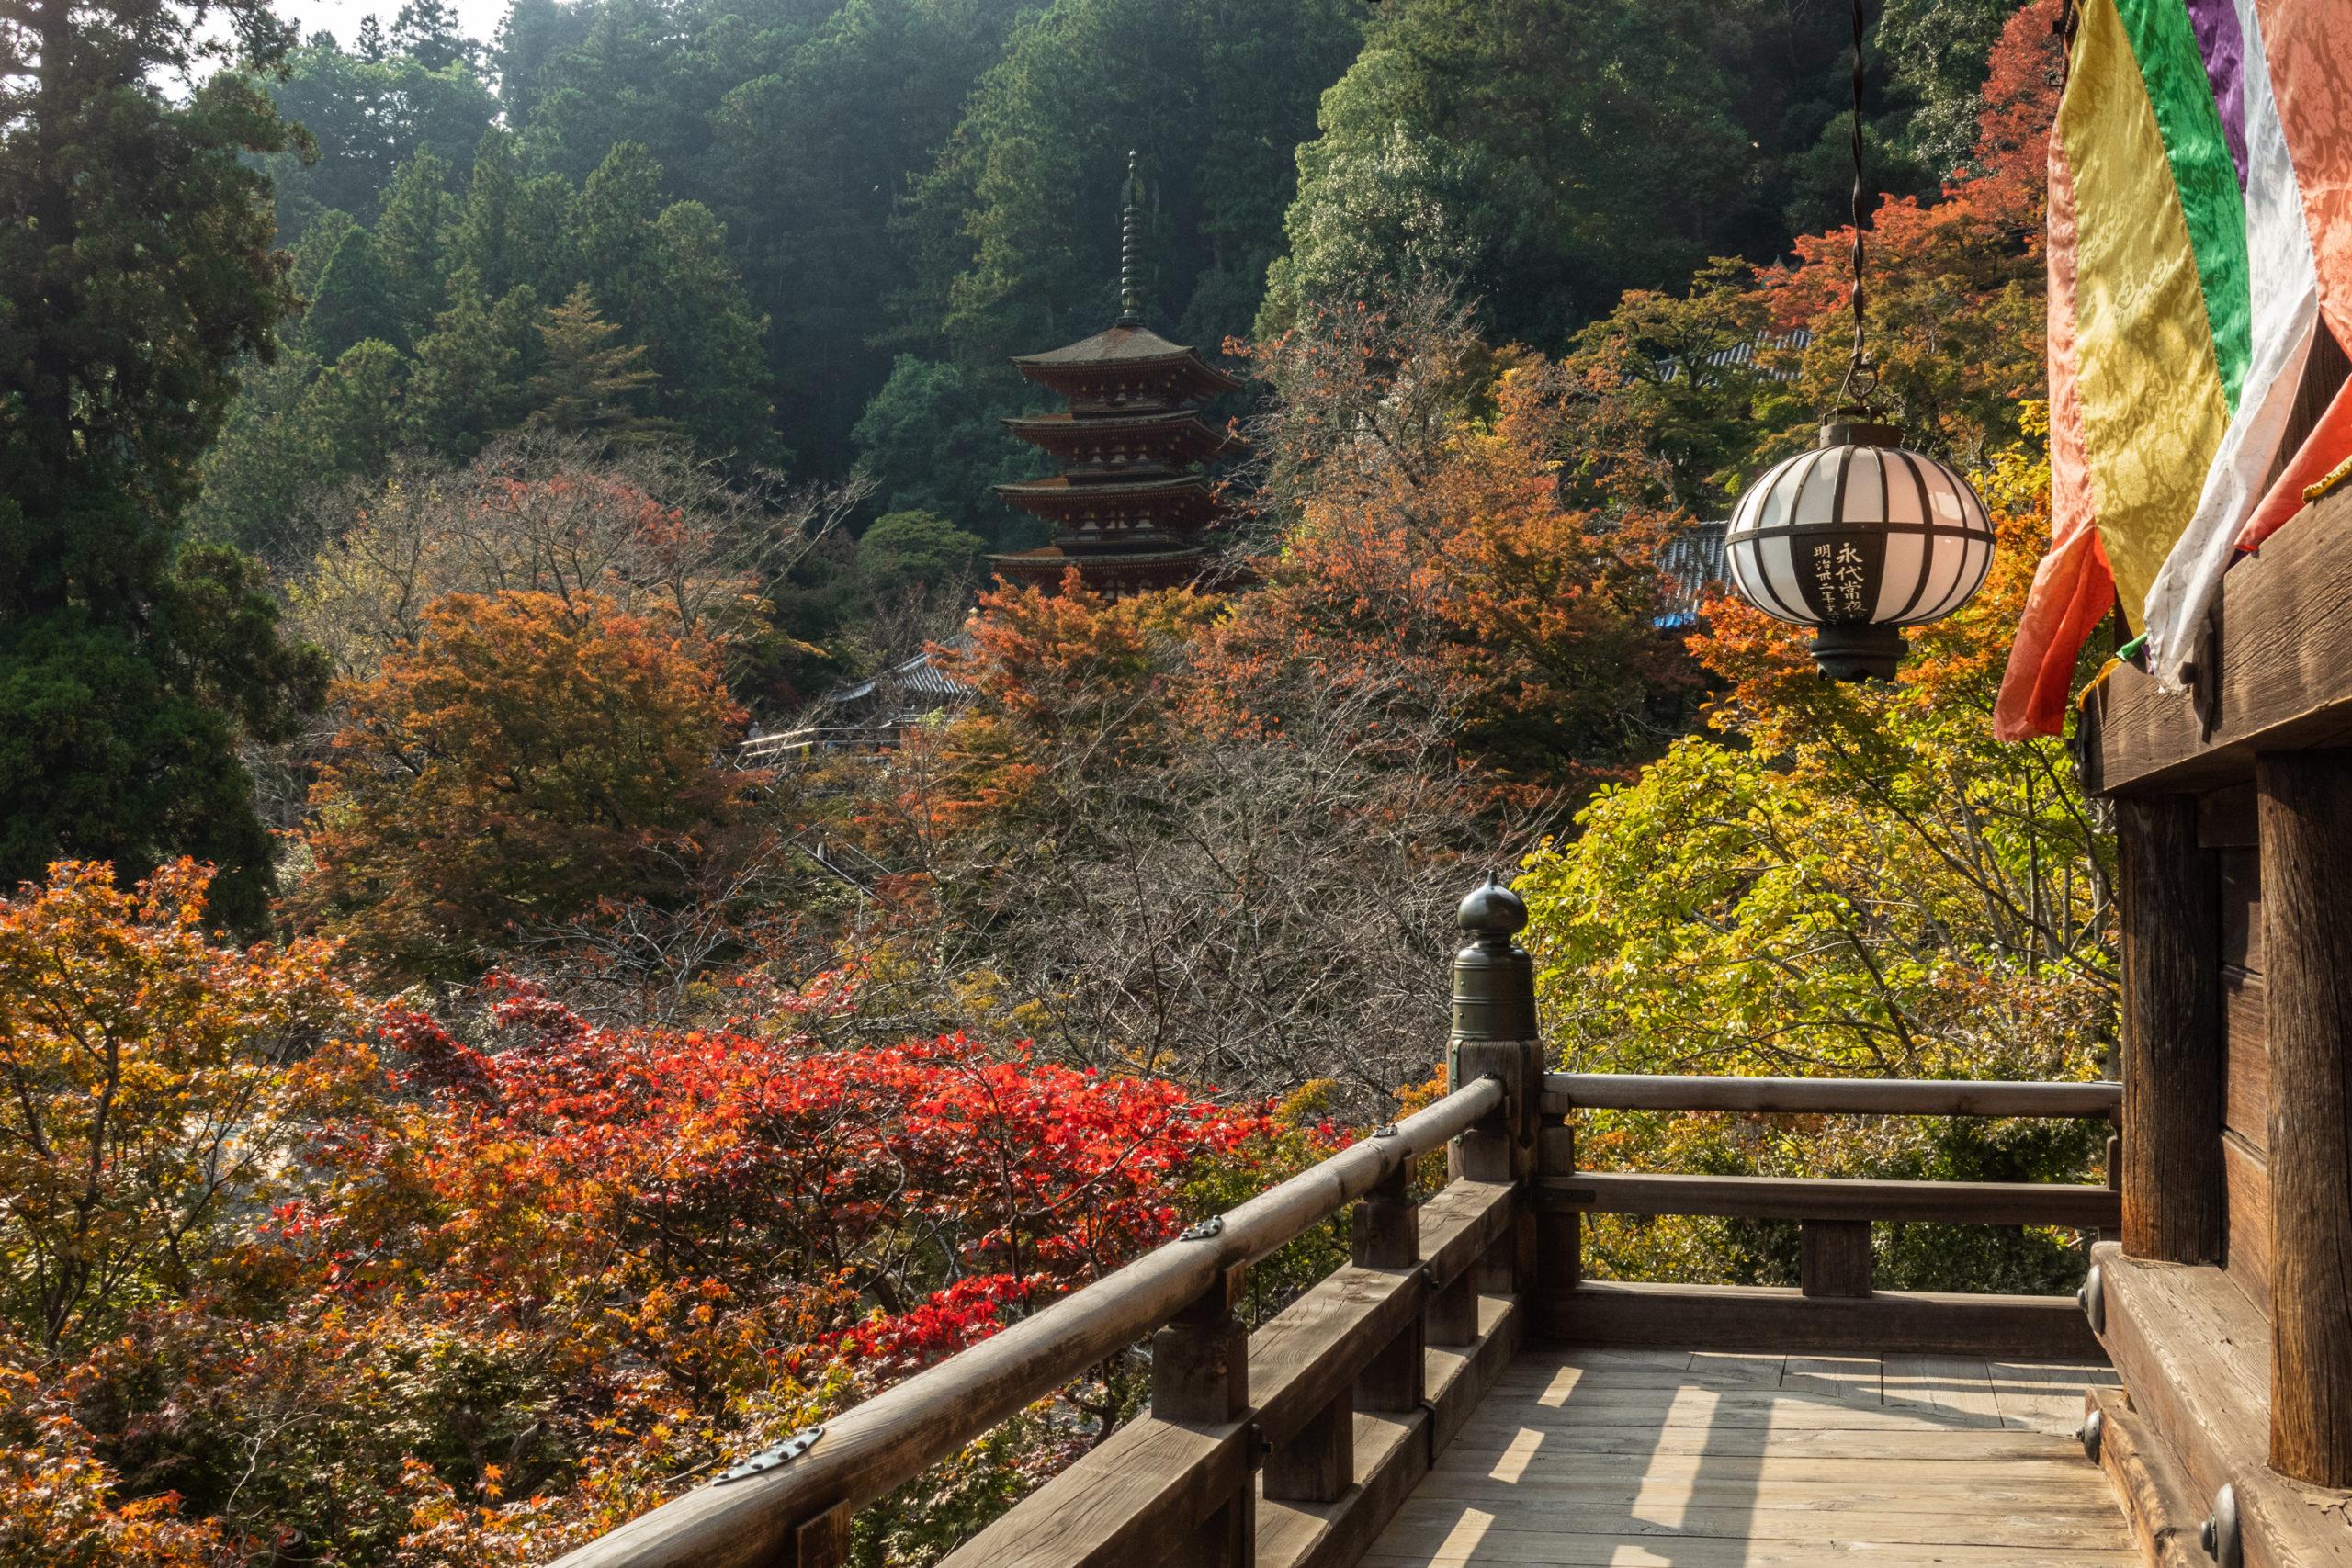 DSC00360-scaled 奈良県  長谷寺(風情を感じる五重塔と紅葉景色が美しい秋のおすすめスポット! 撮影した写真の紹介、アクセス情報や駐車場情報など)